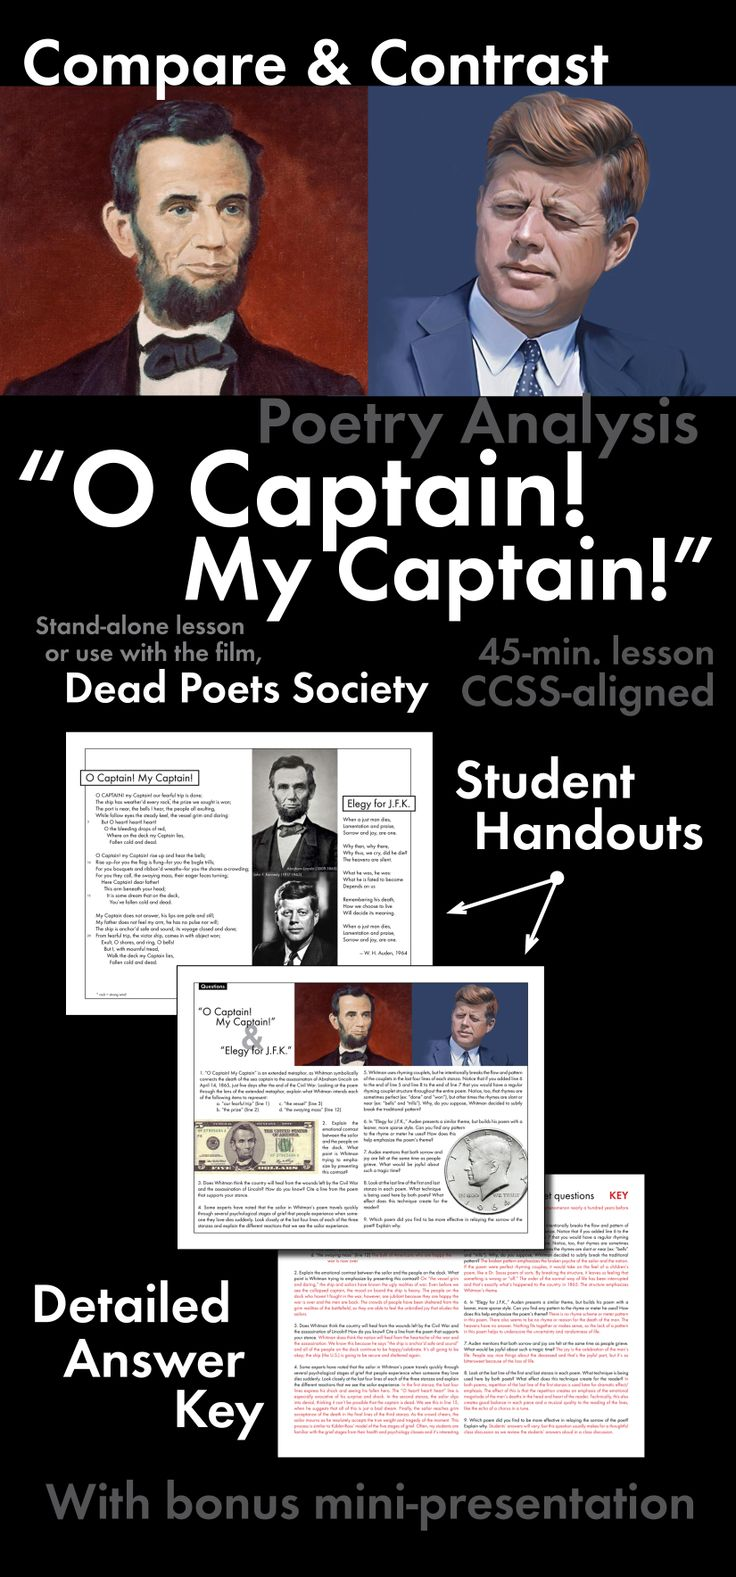 Dead poets society analysis essay